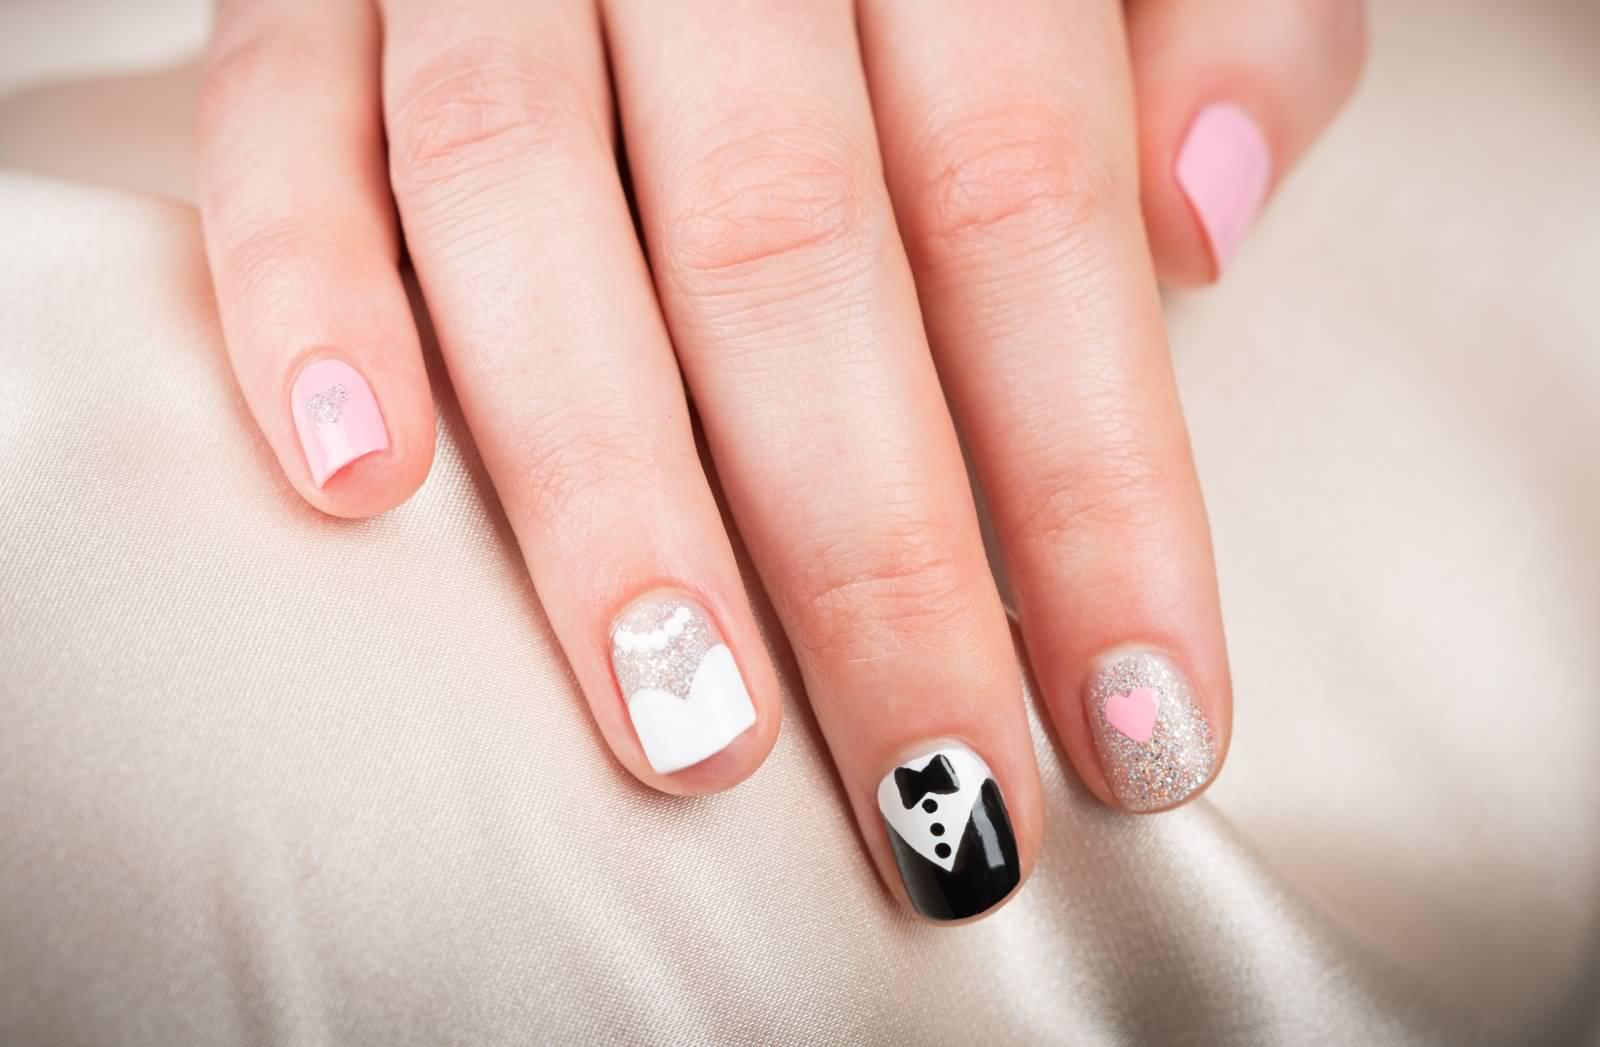 50 Most Beautiful Wedding Nail Art Design Ideas For Bridal